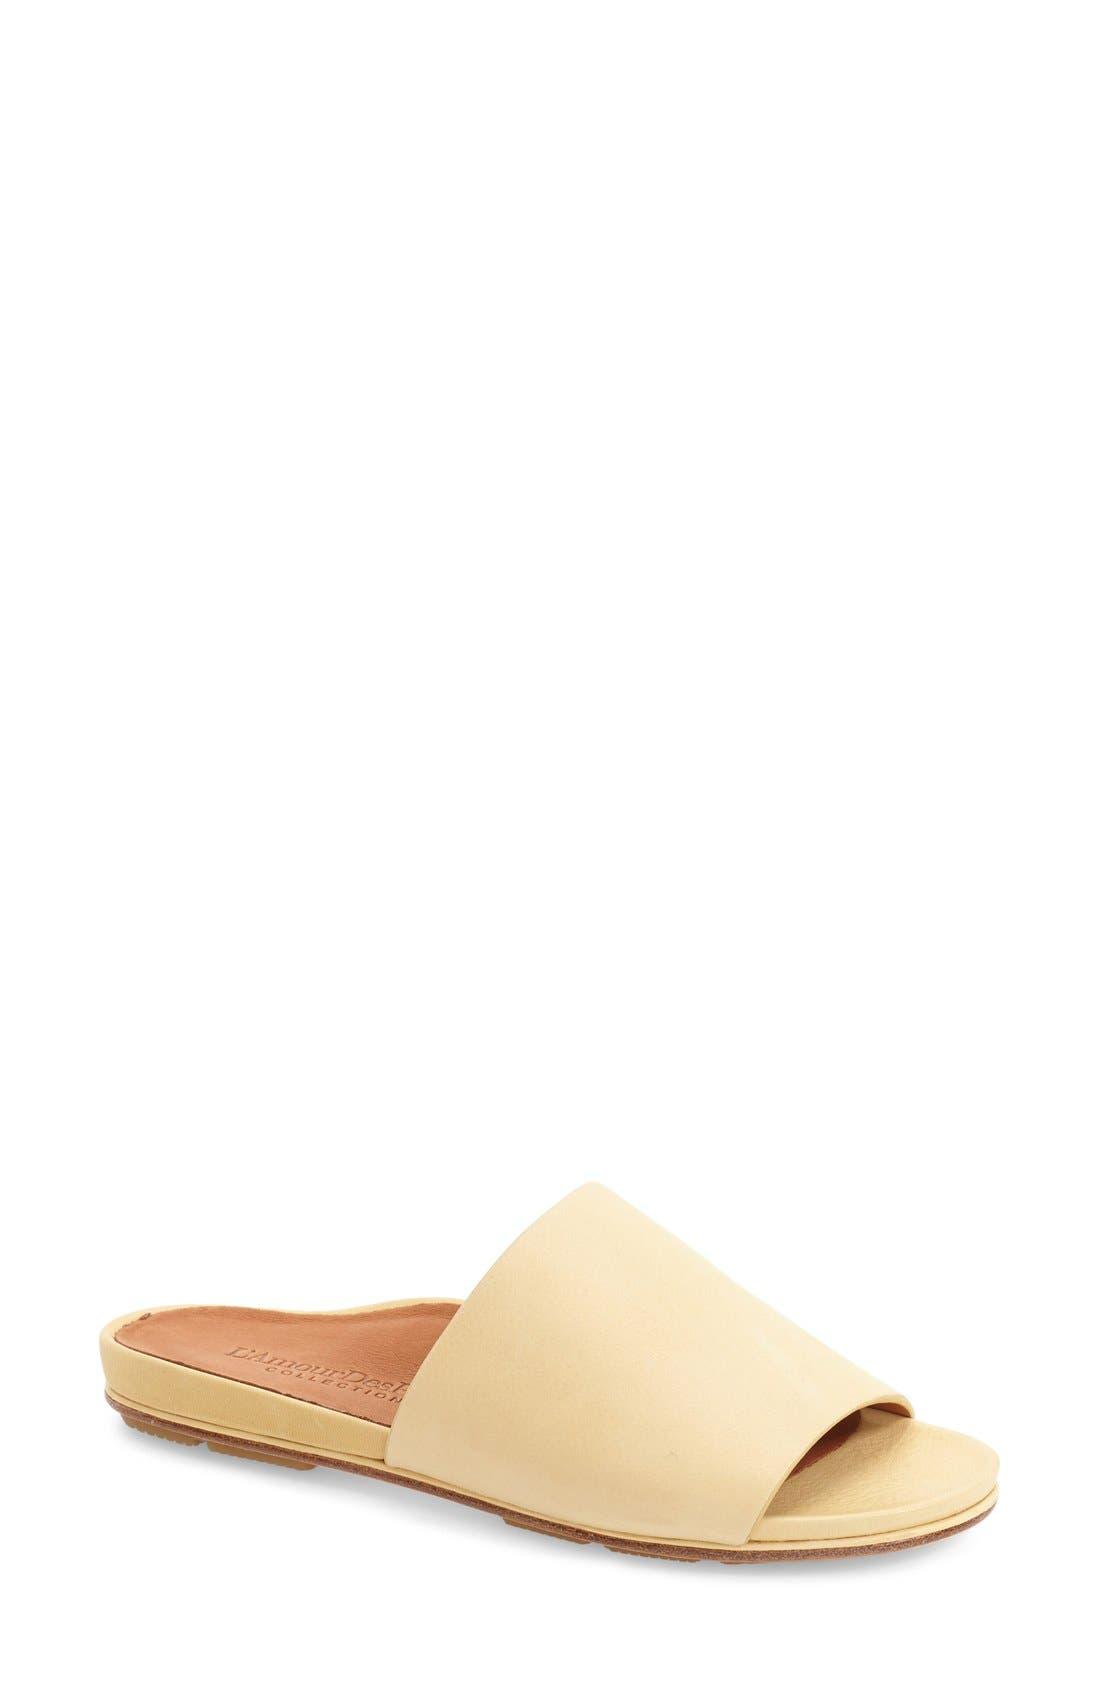 L'AMOUR DES PIEDS 'Daney' Flat Slide Sandal